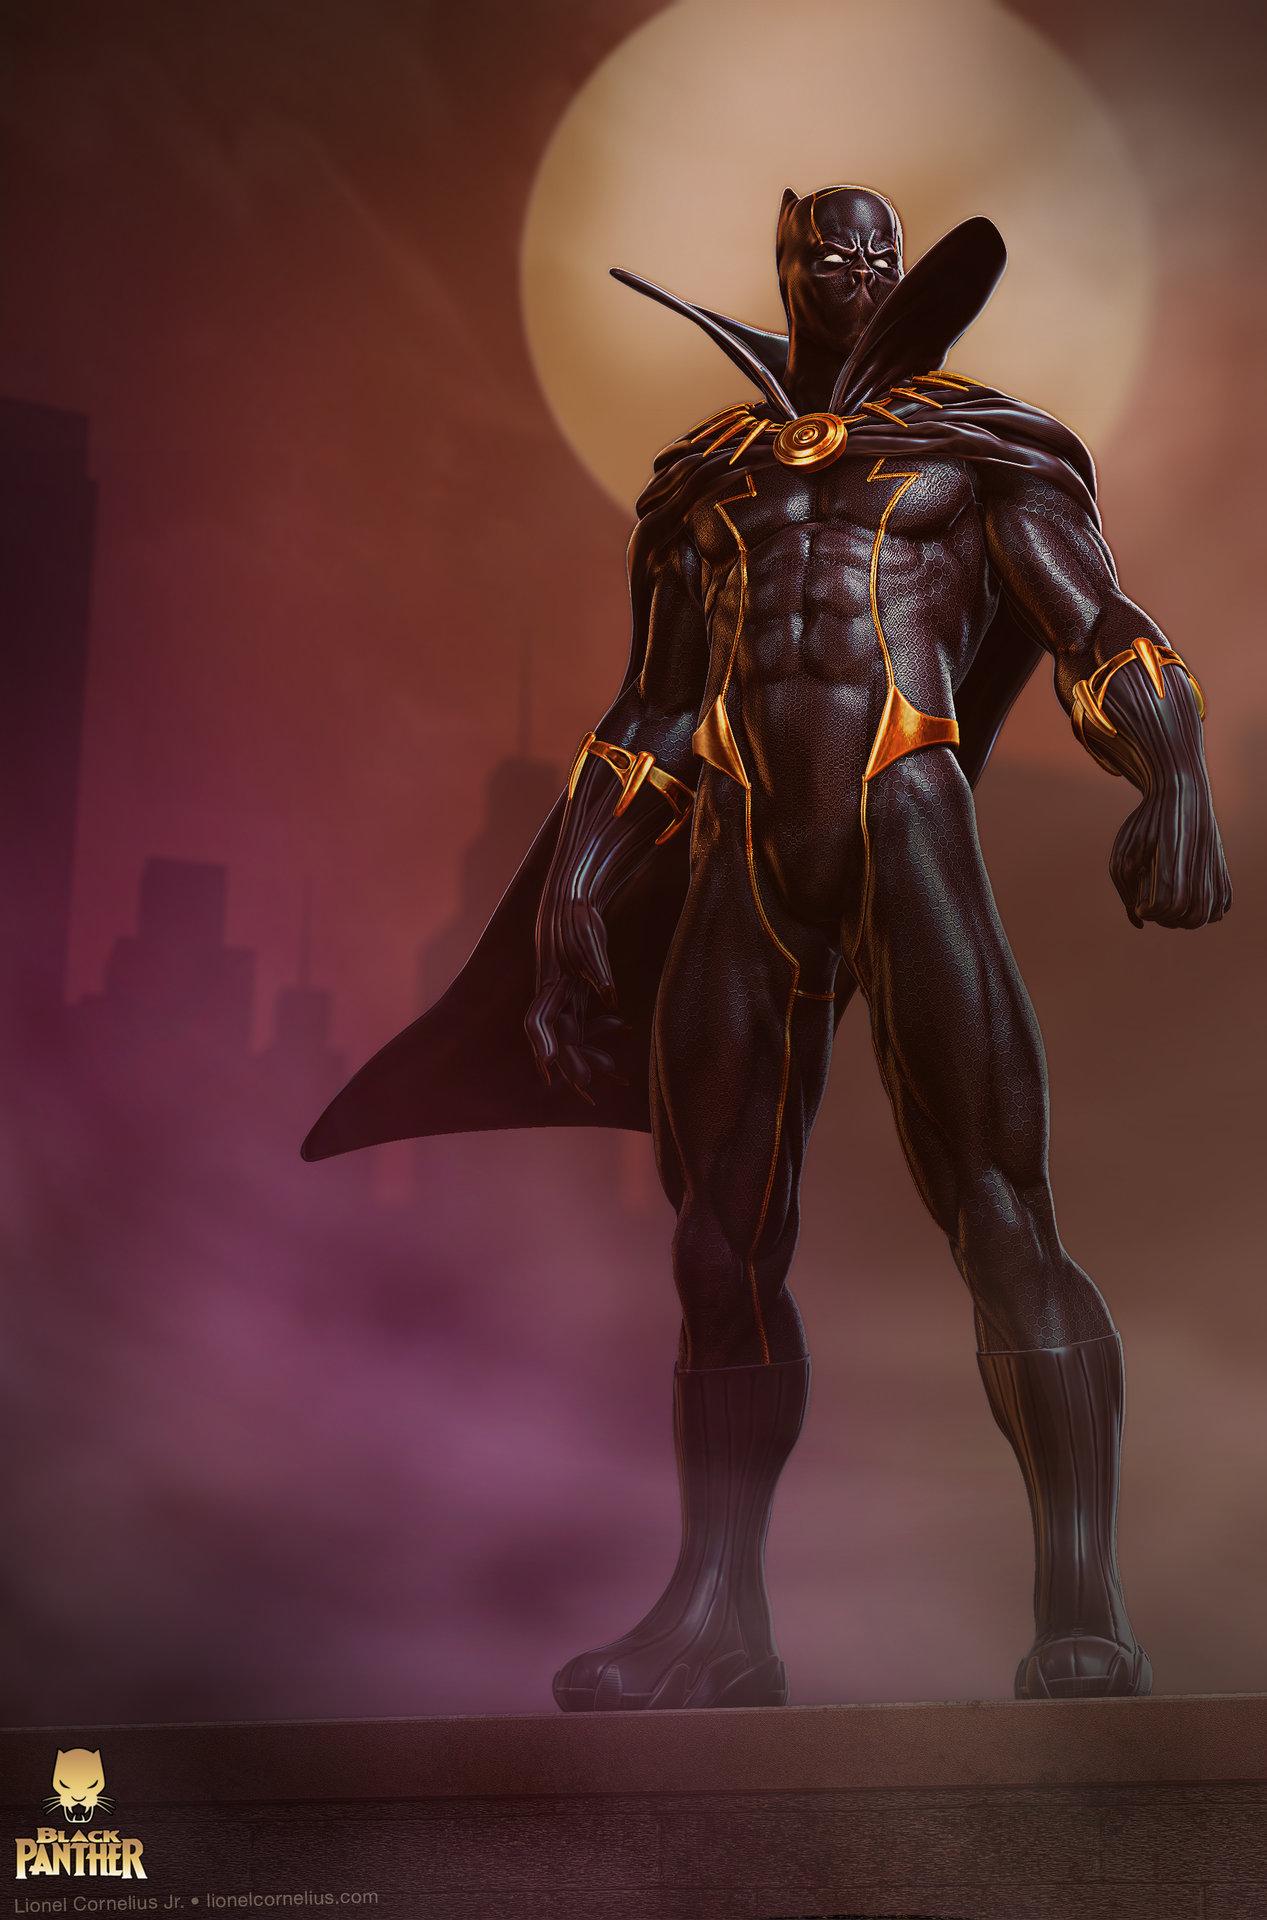 Artstation - Black Panther Lionel Cornelius Jr